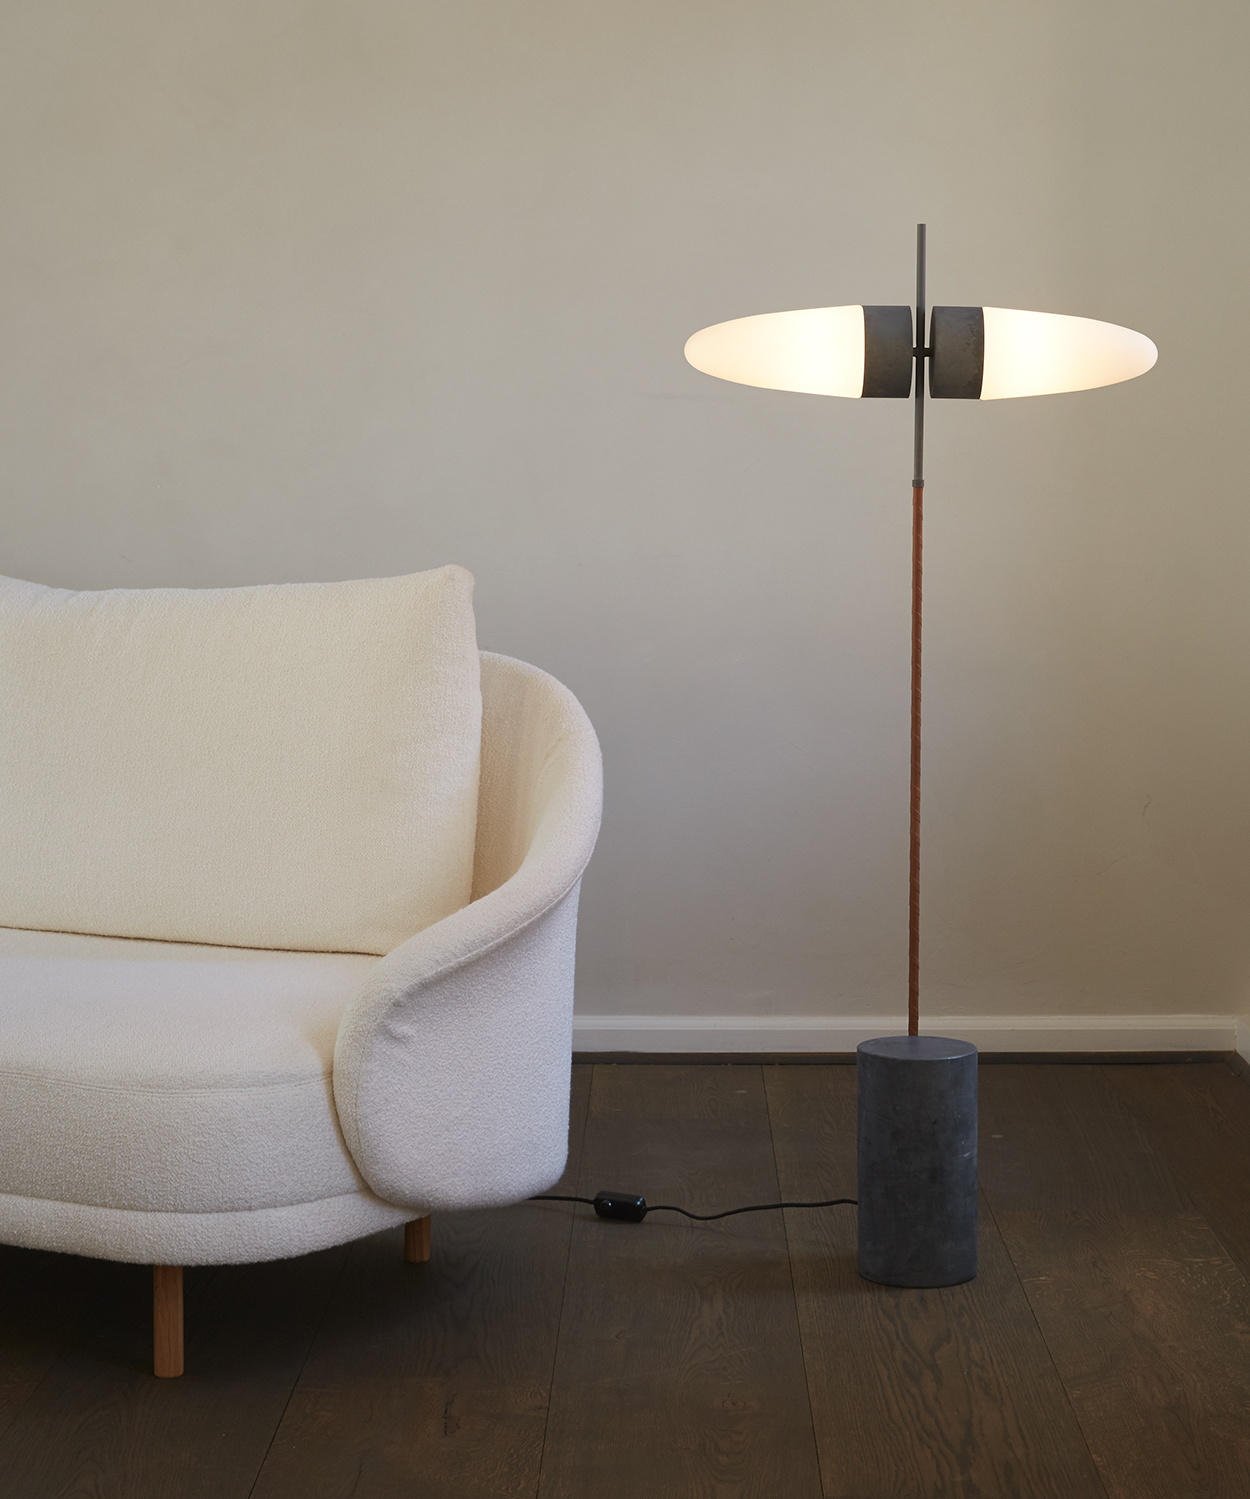 101 Copenhagen Oxidised Bull Floor Lamp near sofa